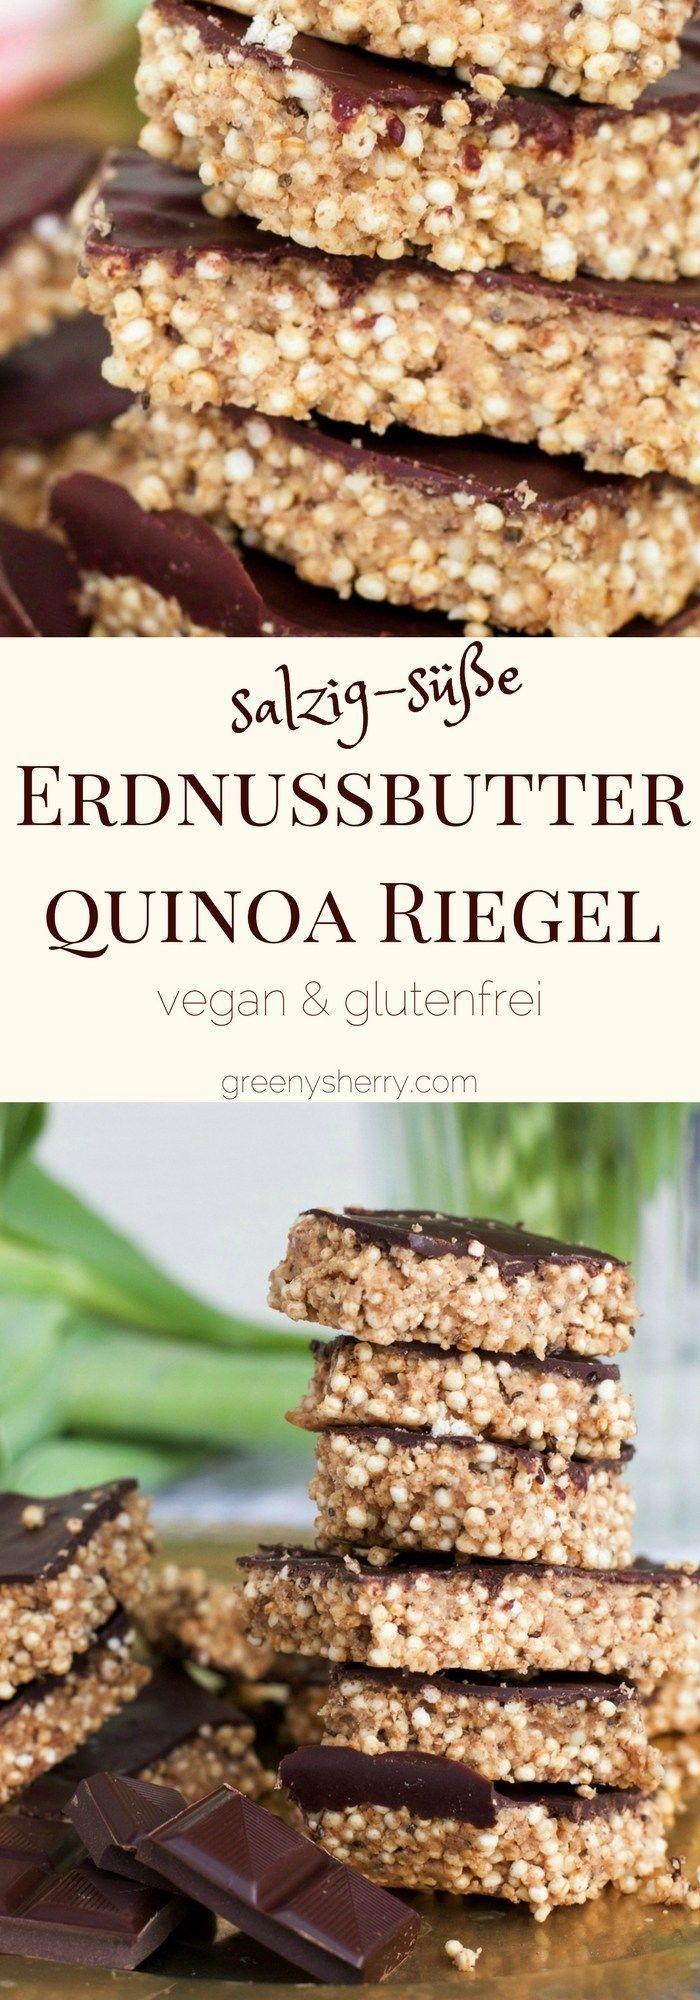 peanut butter Quinoa bar with chocolate (vegan & gluten-free   - Healthy -